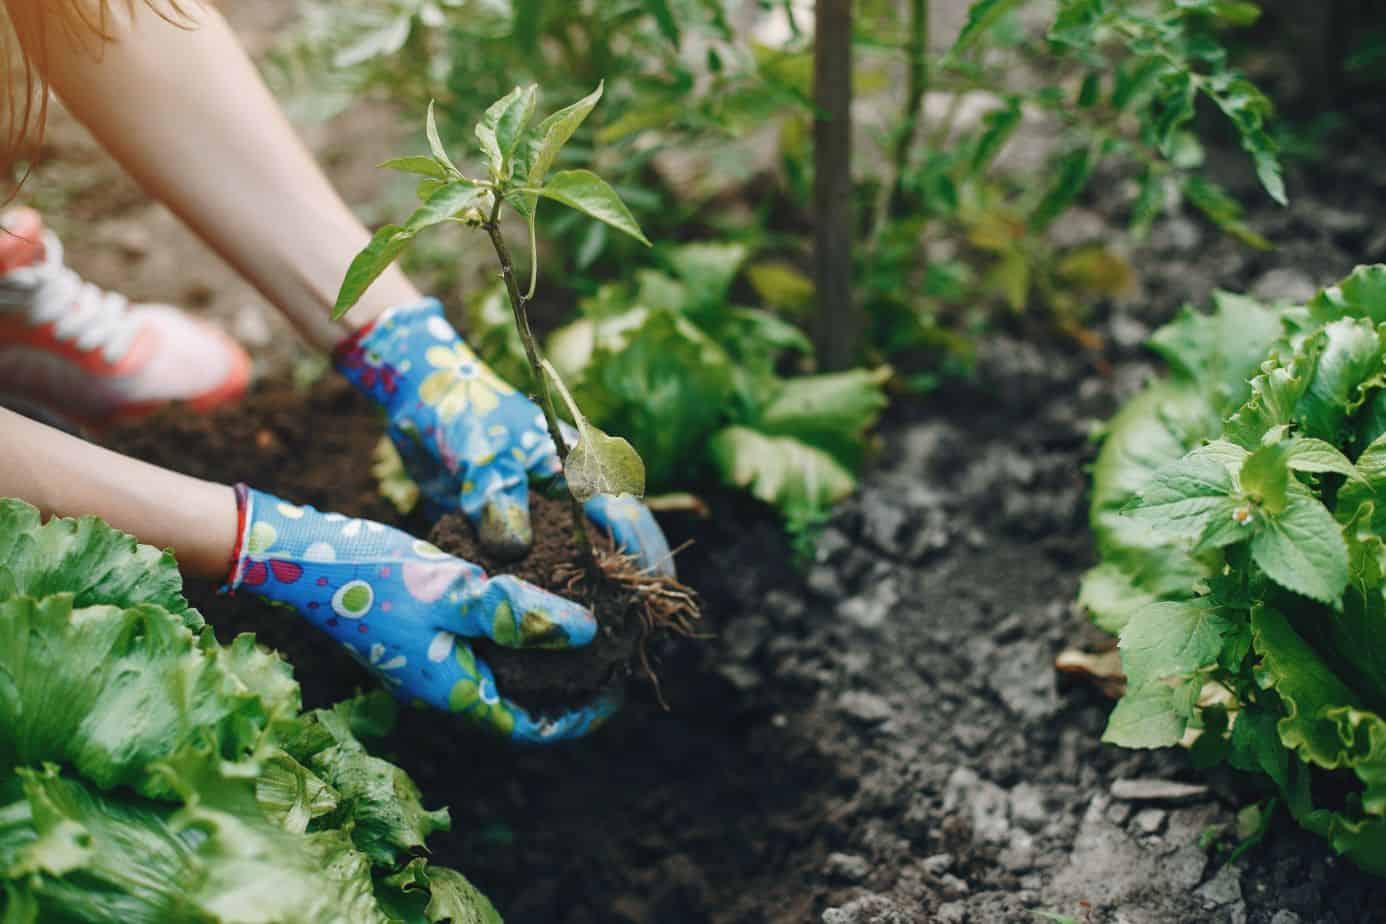 vegetable-gardening-tips-6-decide-on-the-best-plot-size